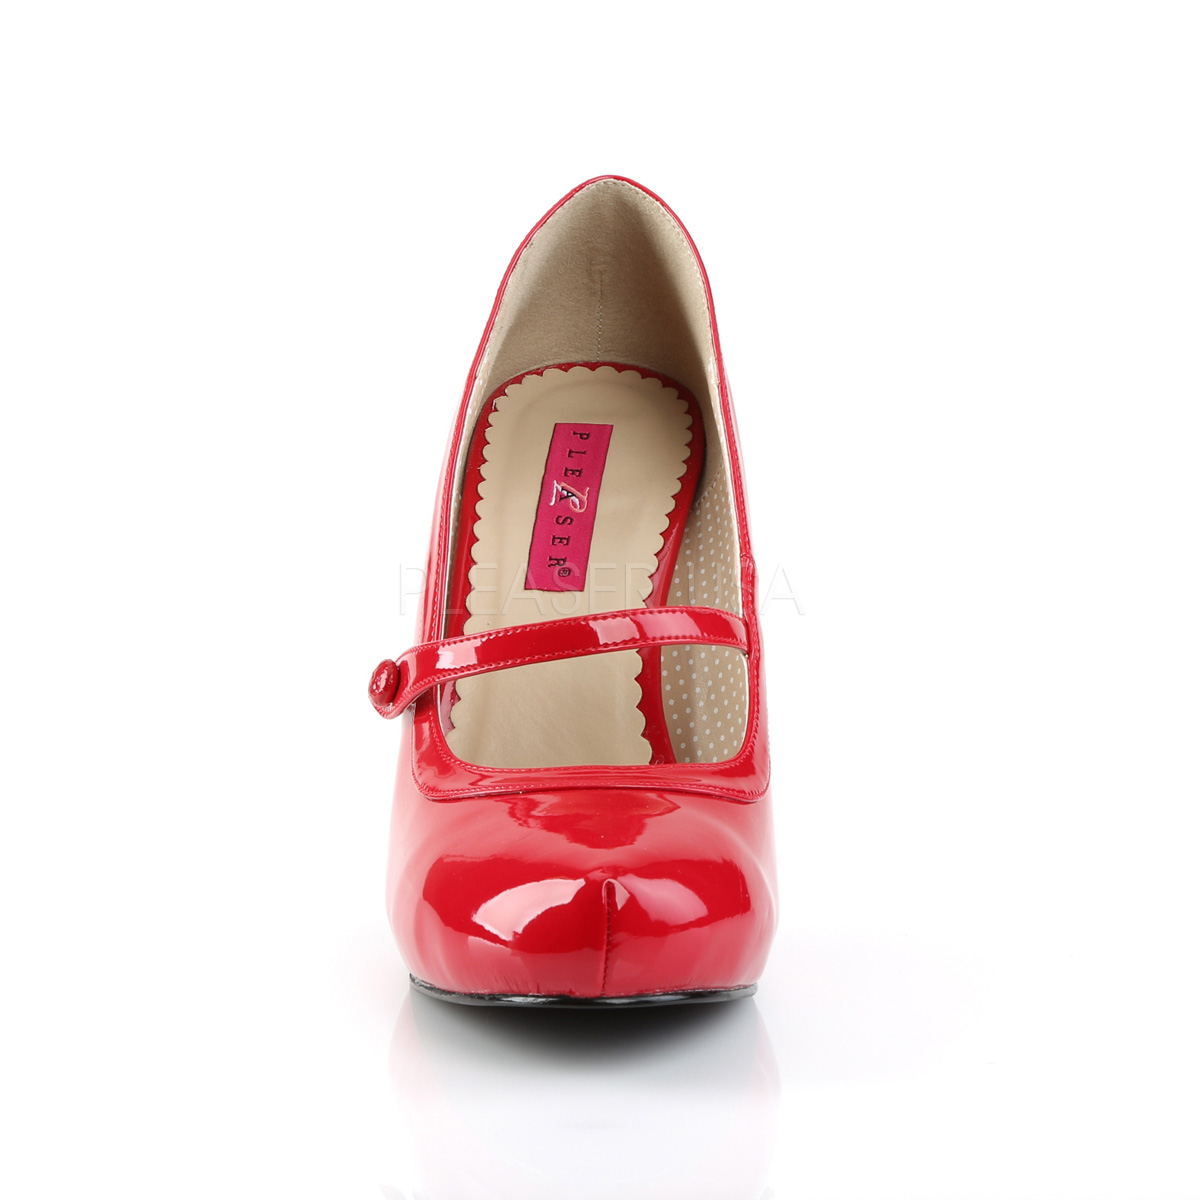 Pleaser Pink Label PINUP-01 パンプス 4 1/2inch Heel, 3/4inch Hidden PF Maryjane Pump◆取り寄せ